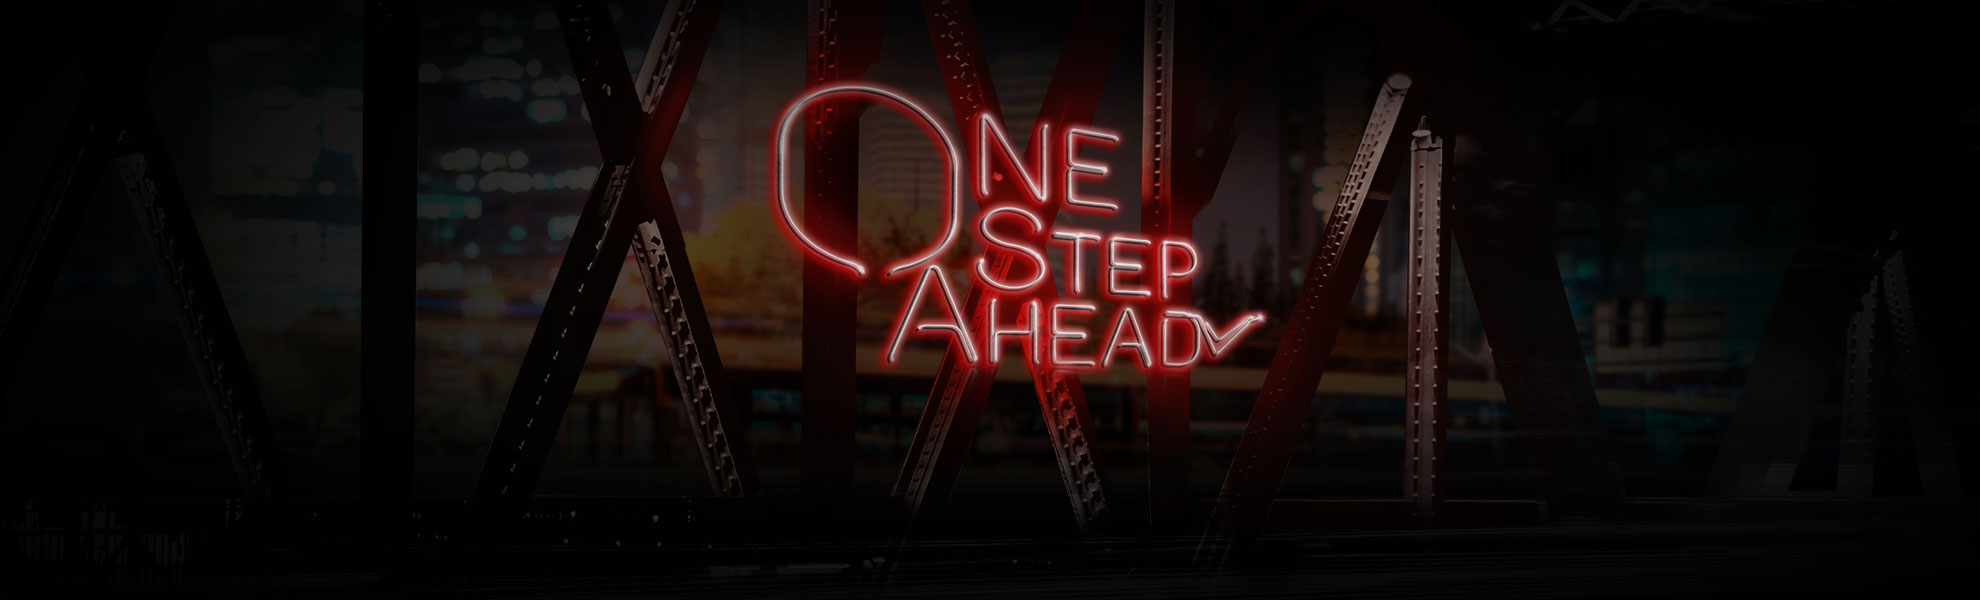 ONE-STEP-AHEAD_BIO